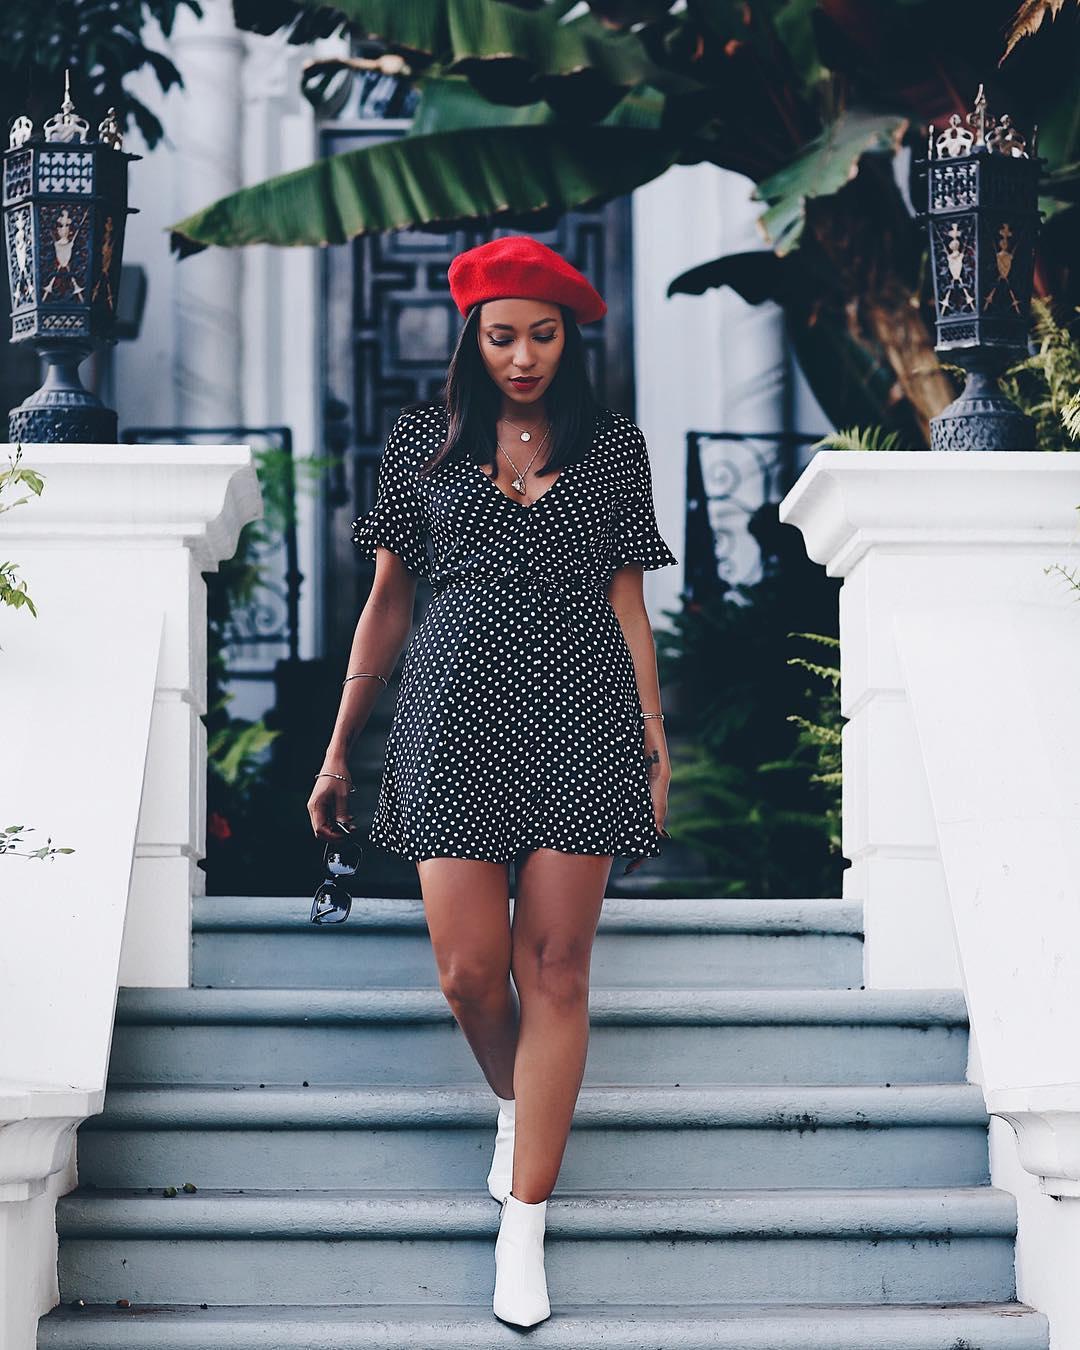 berets-taking-let-bonang-matheba-simi-finding-paola-inspire-chic-beret-styling-options